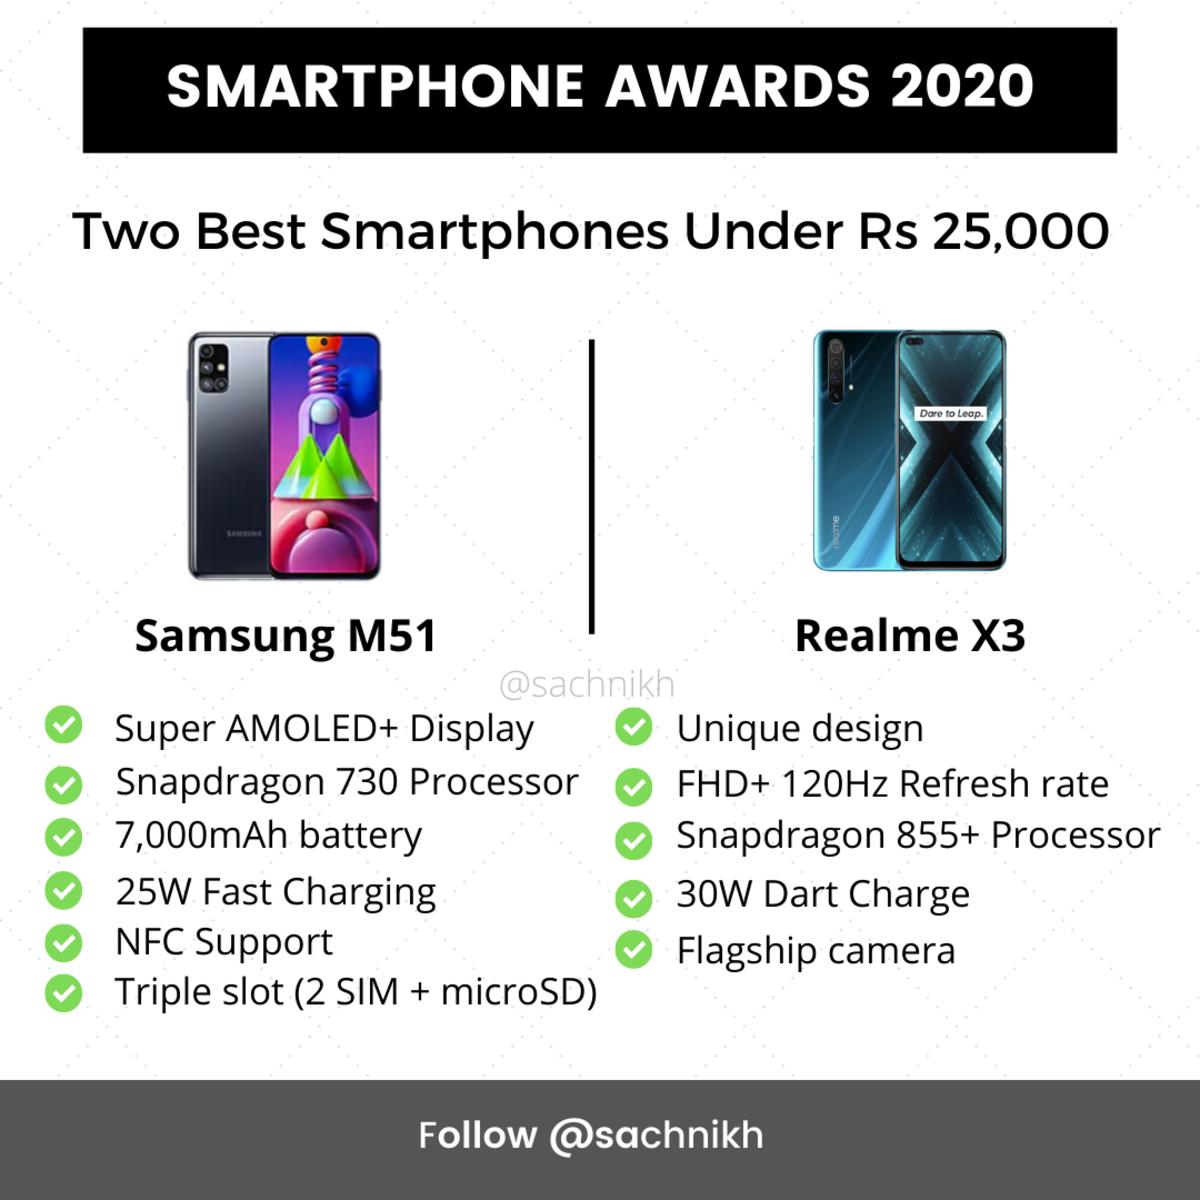 Samsung M51 and Realme X3